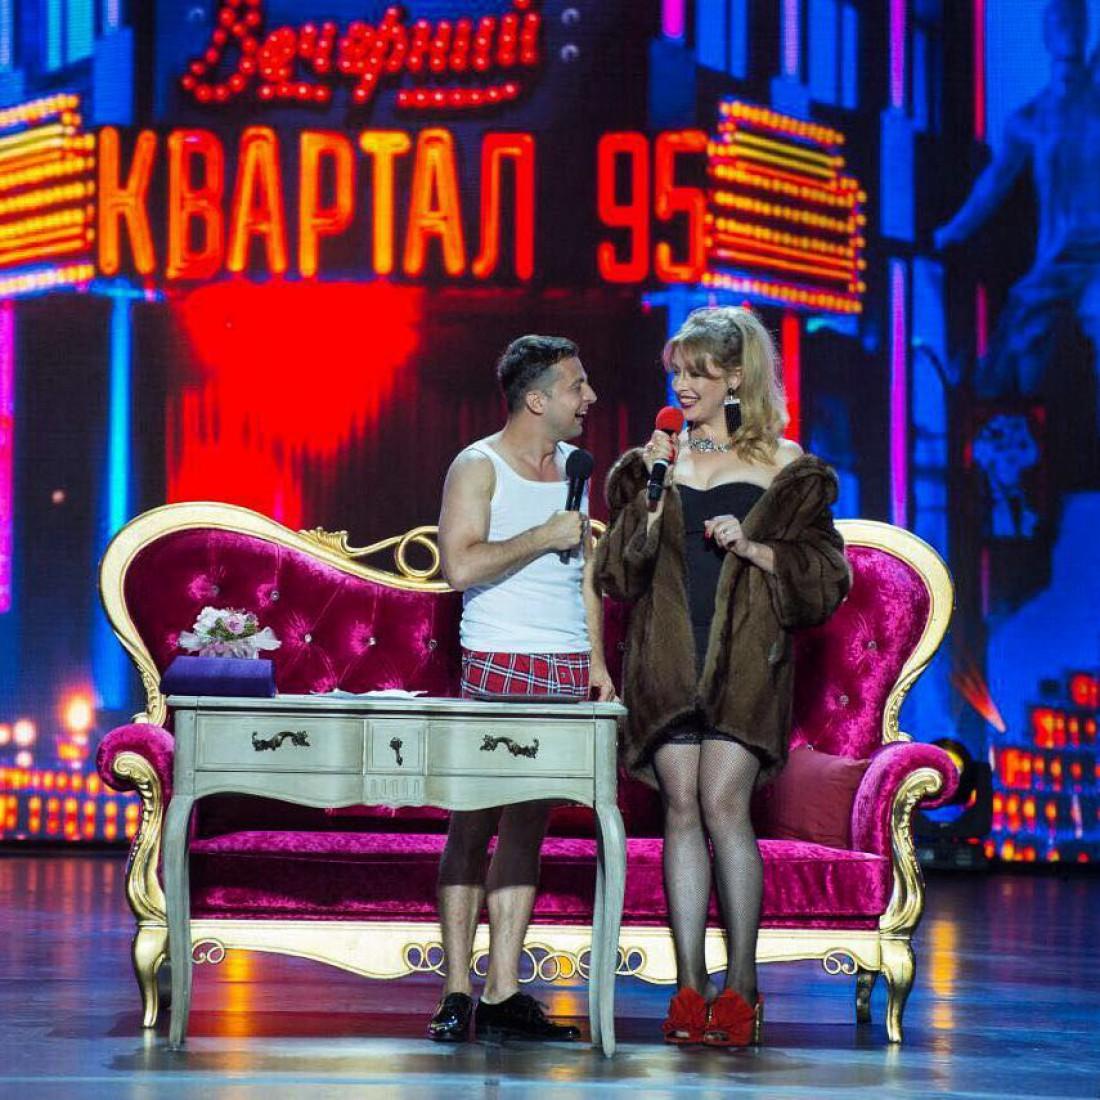 Владимир Зеленский и Елена Кравец